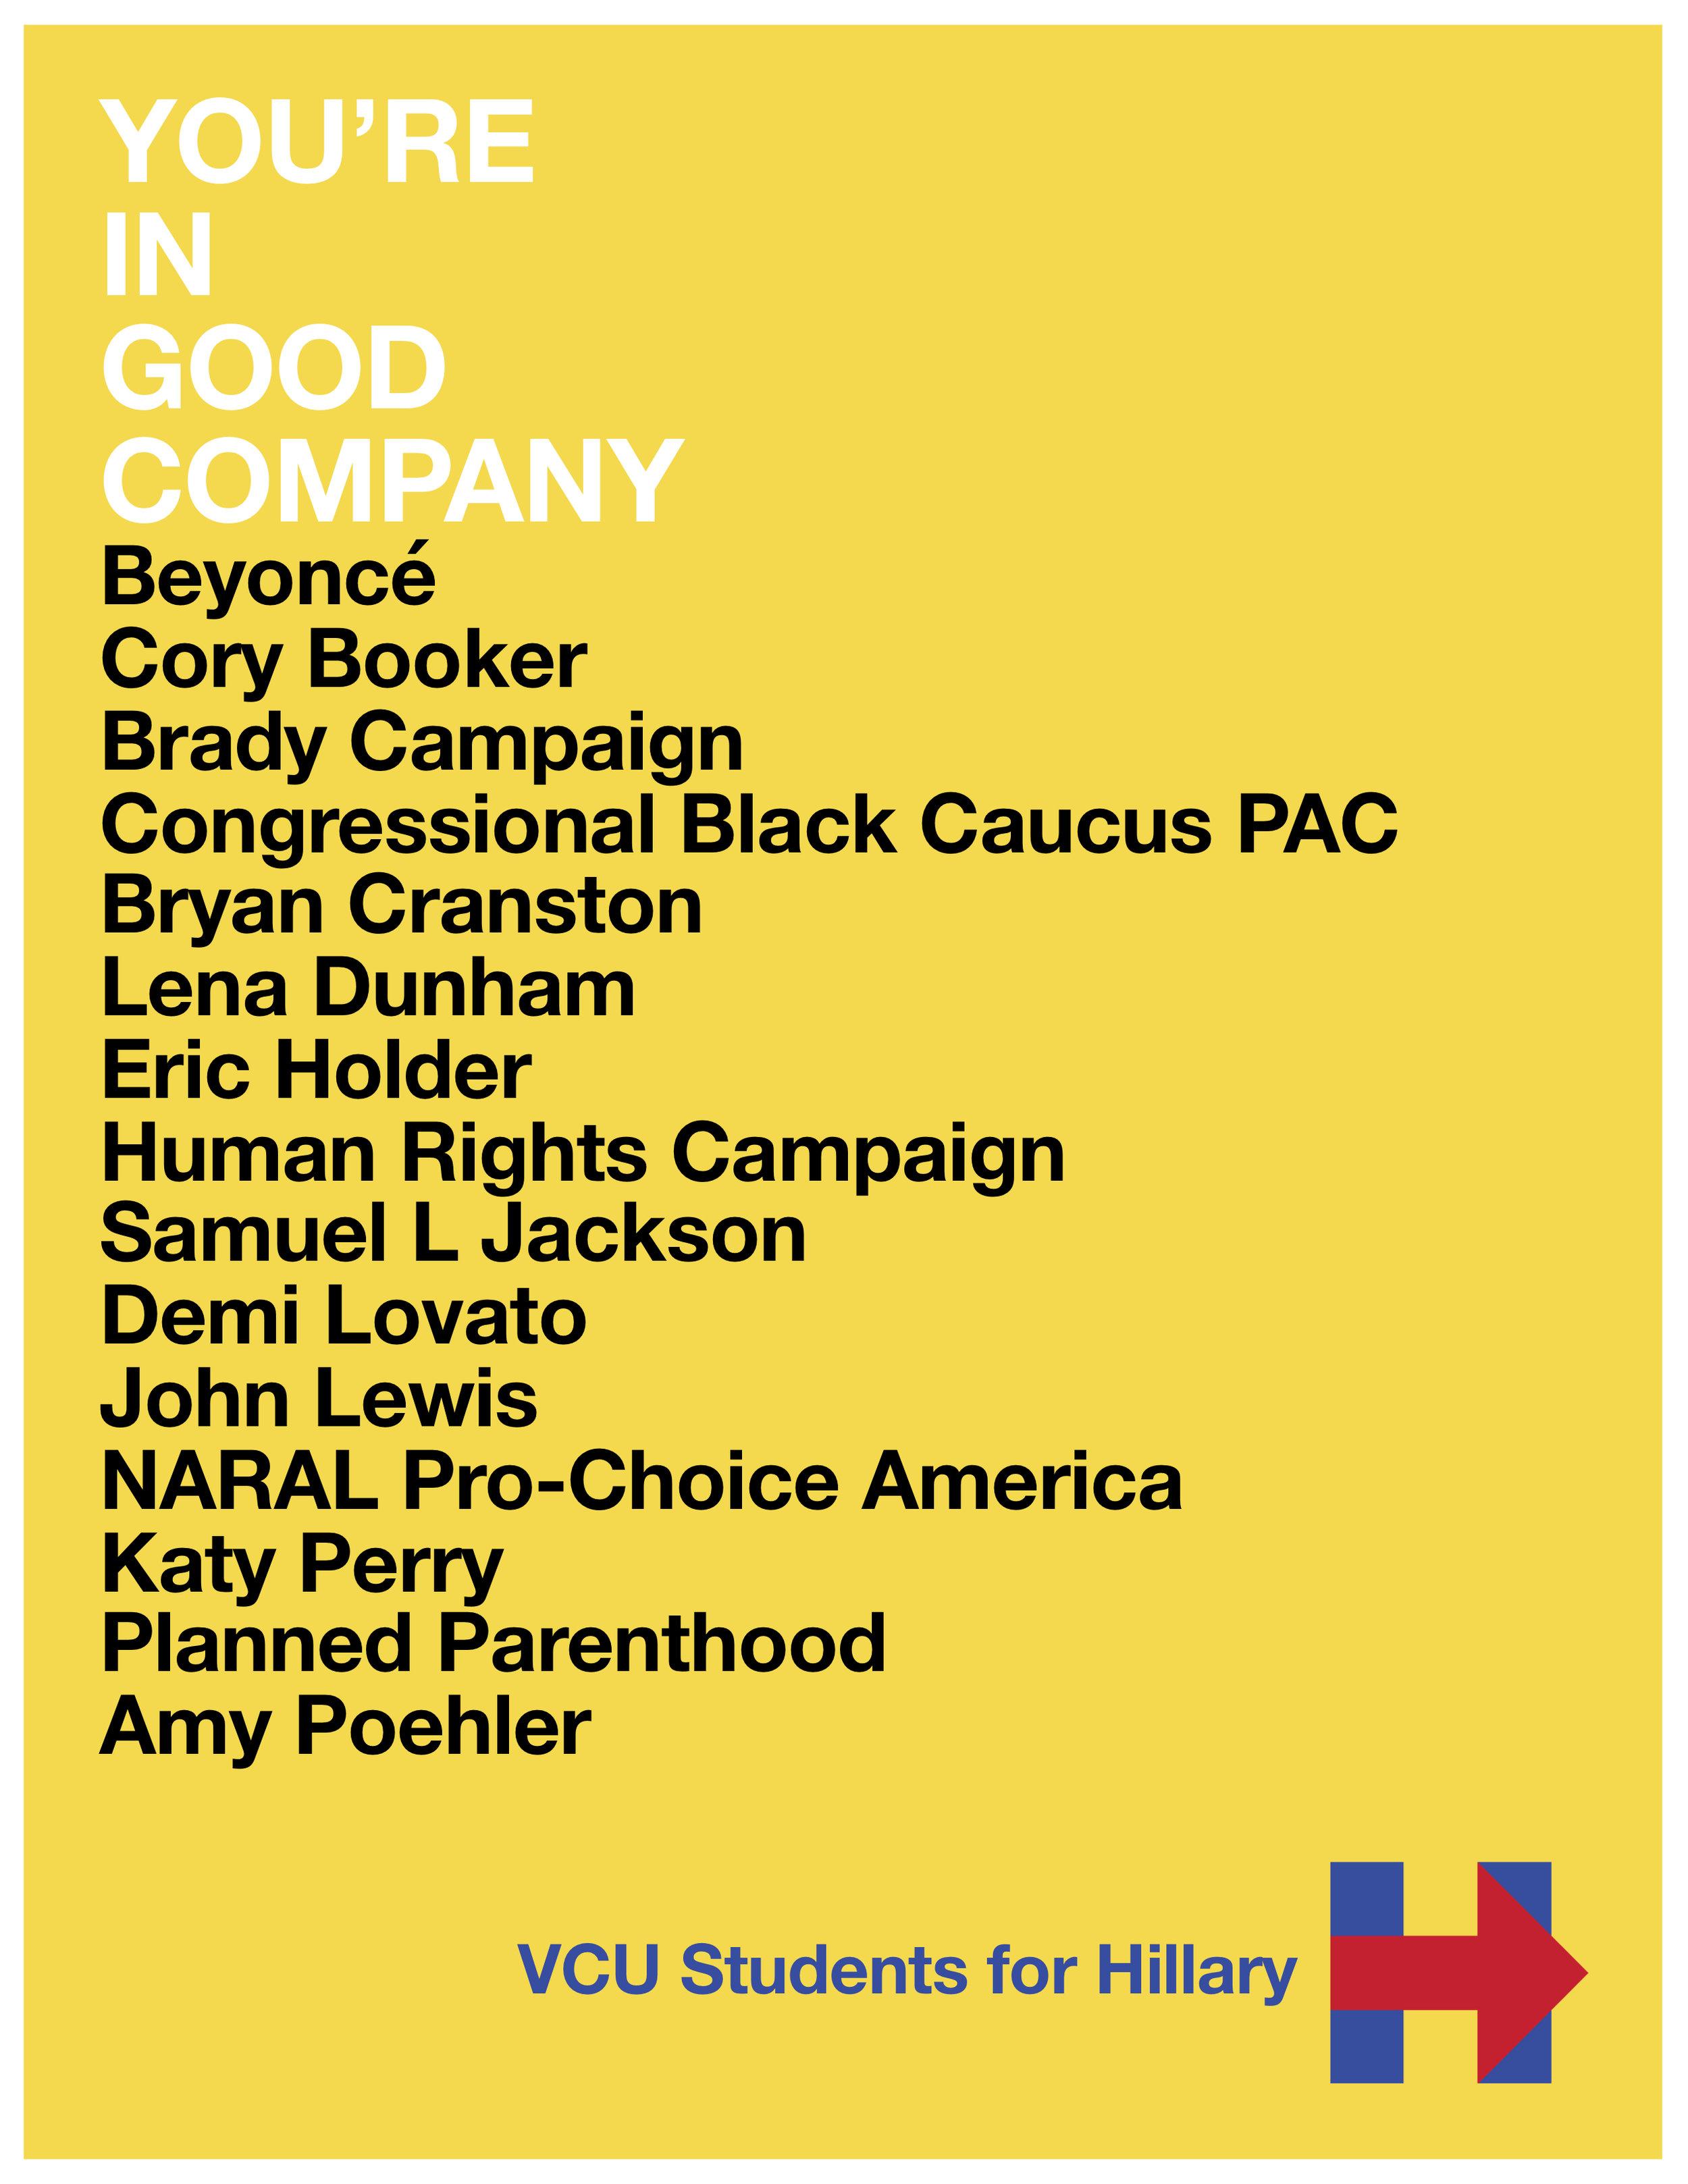 Hillary Poster 1.jpg